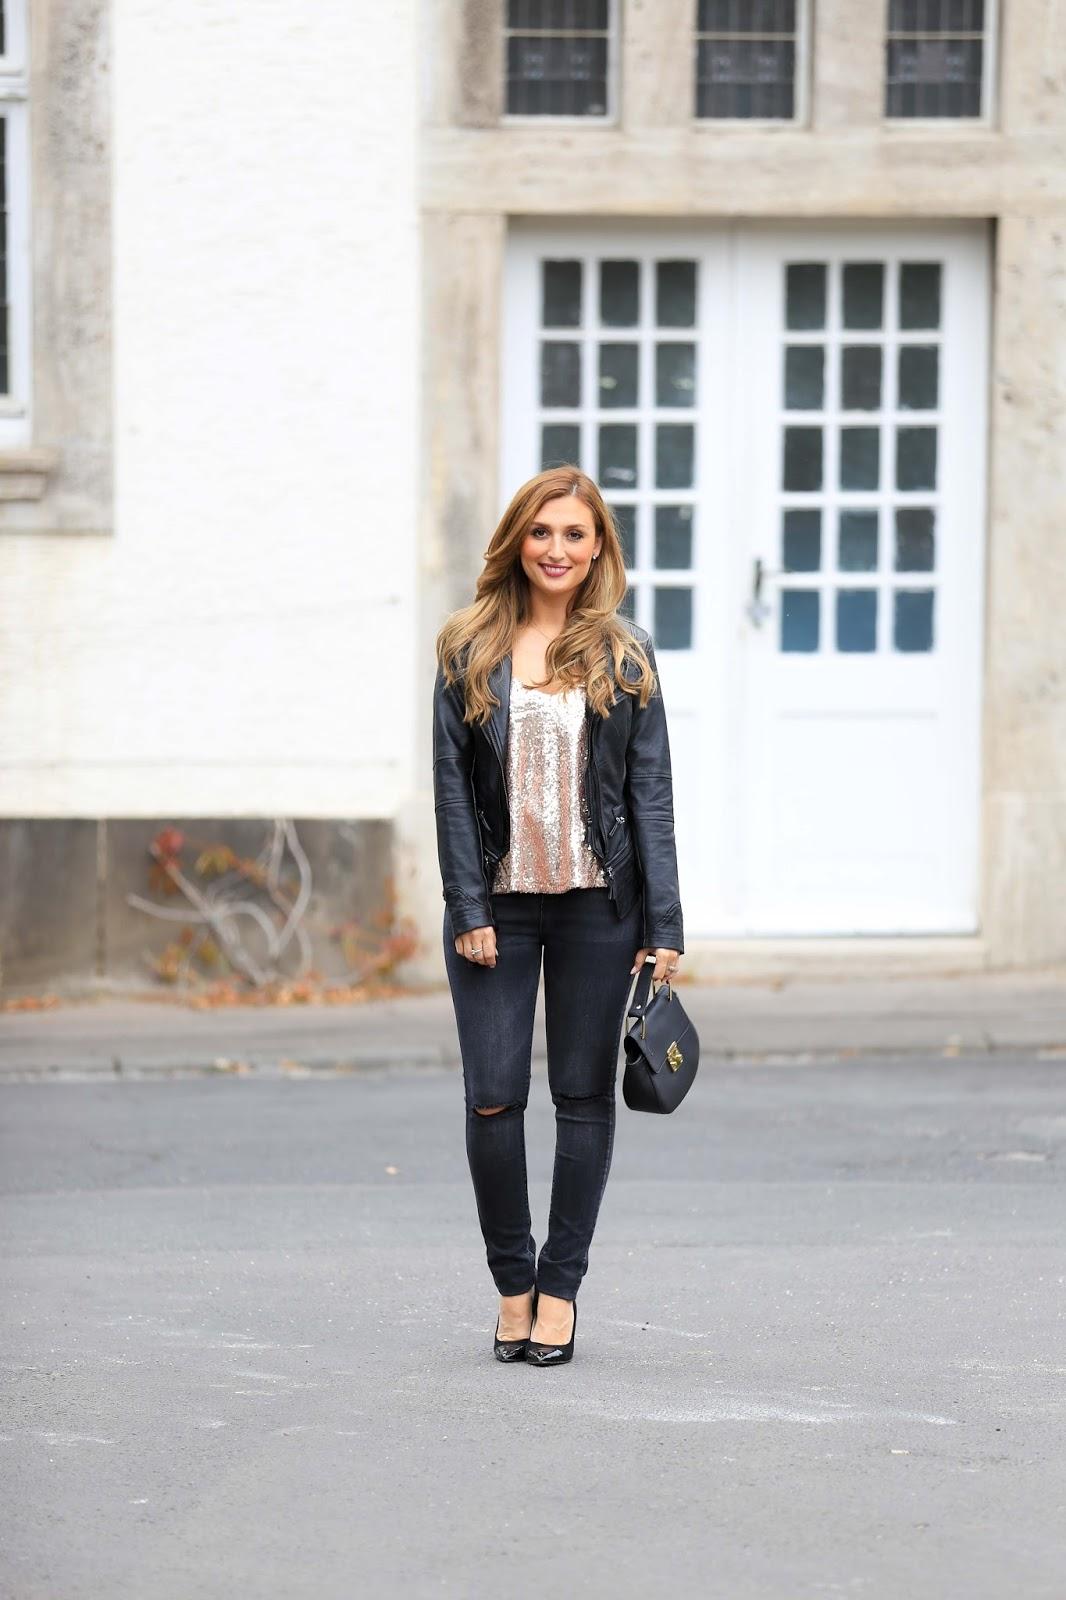 Fashionblogger Lederjacke-Blogger in Lederjacke-Fashionstylebyjohanna-Blogger aus Deutschland